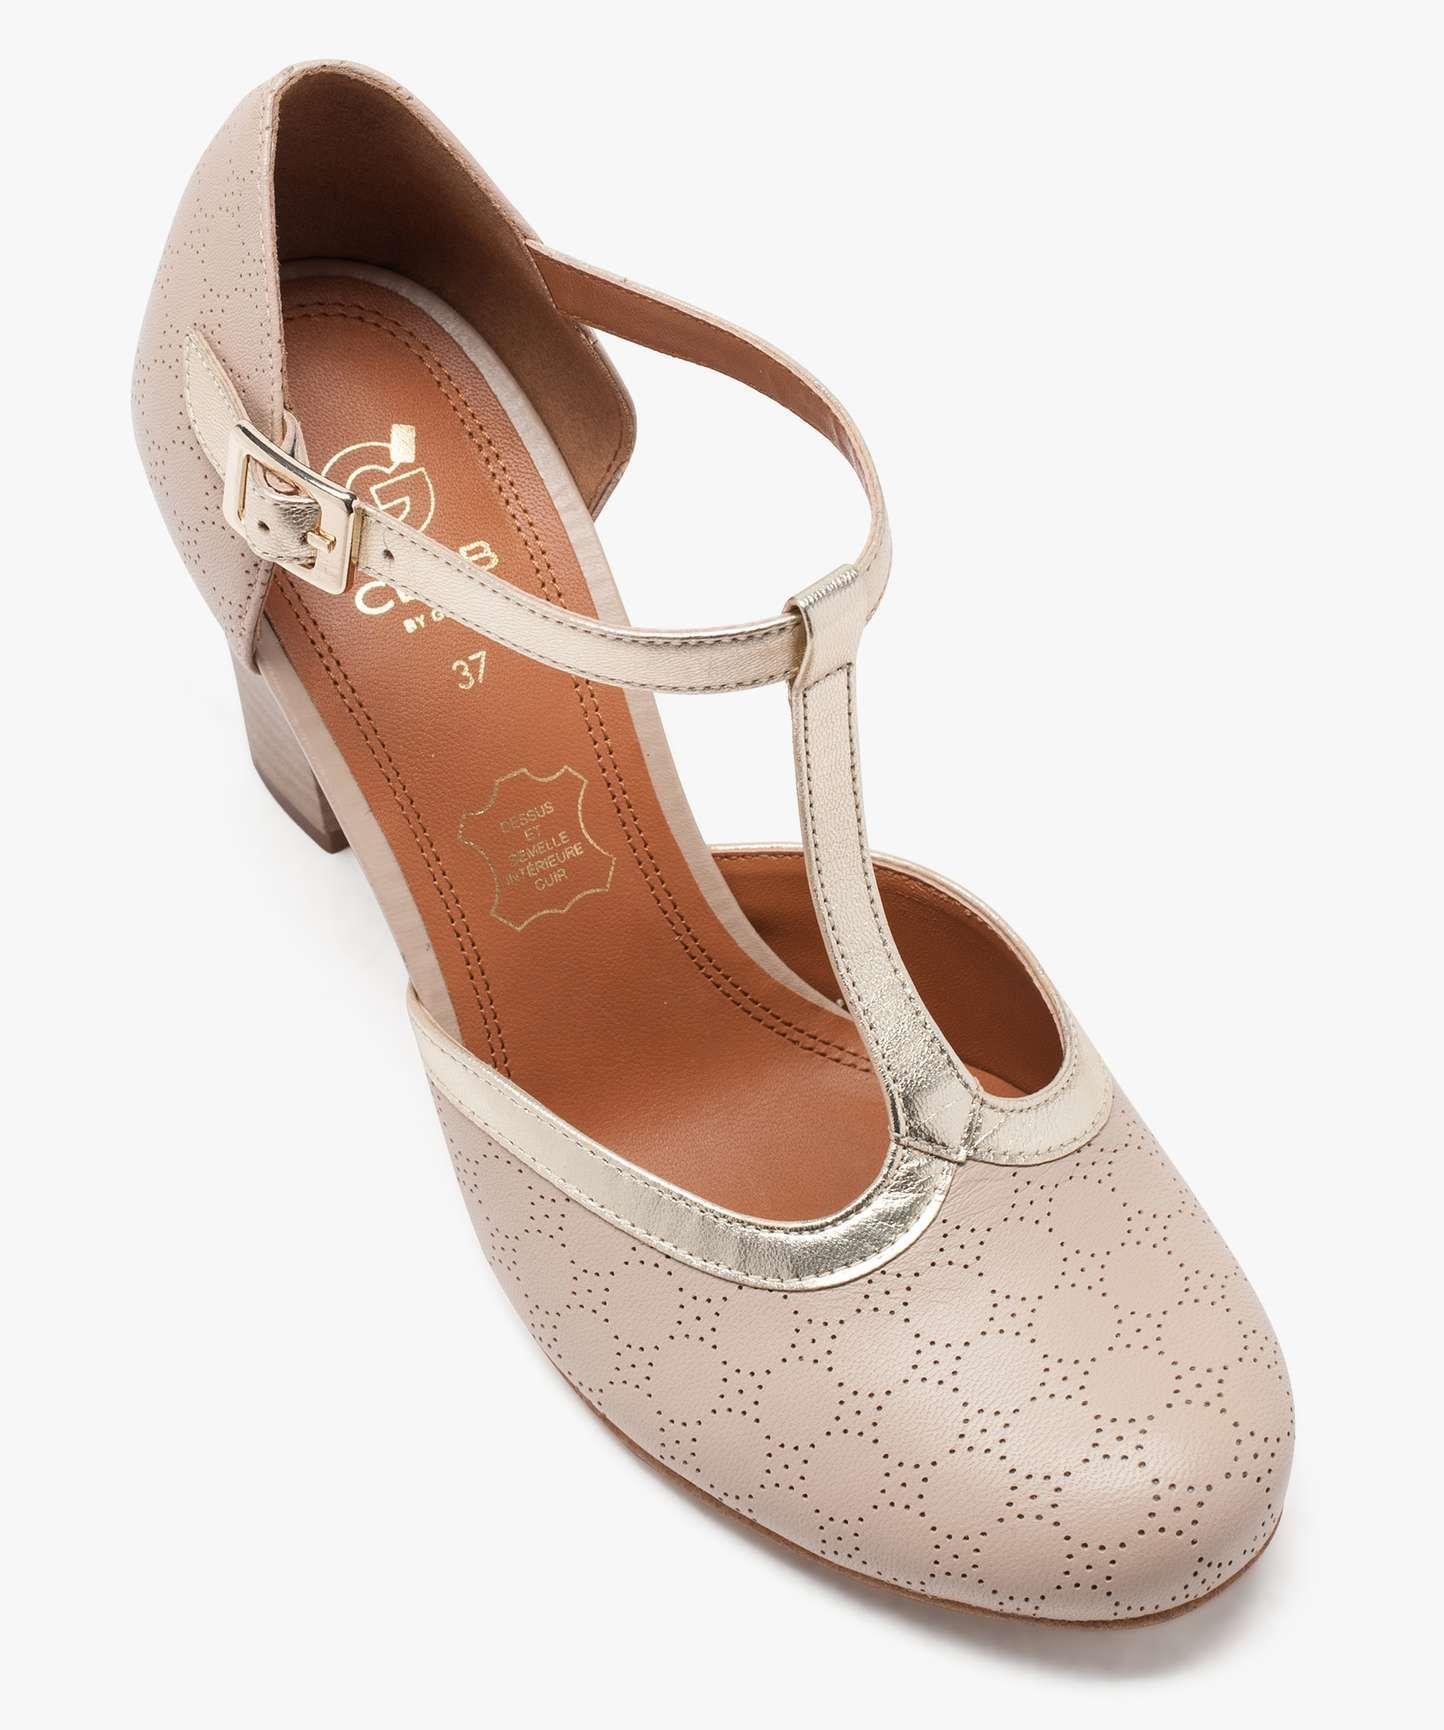 chaussures de mari茅e salom茅,chaussure mariage grande